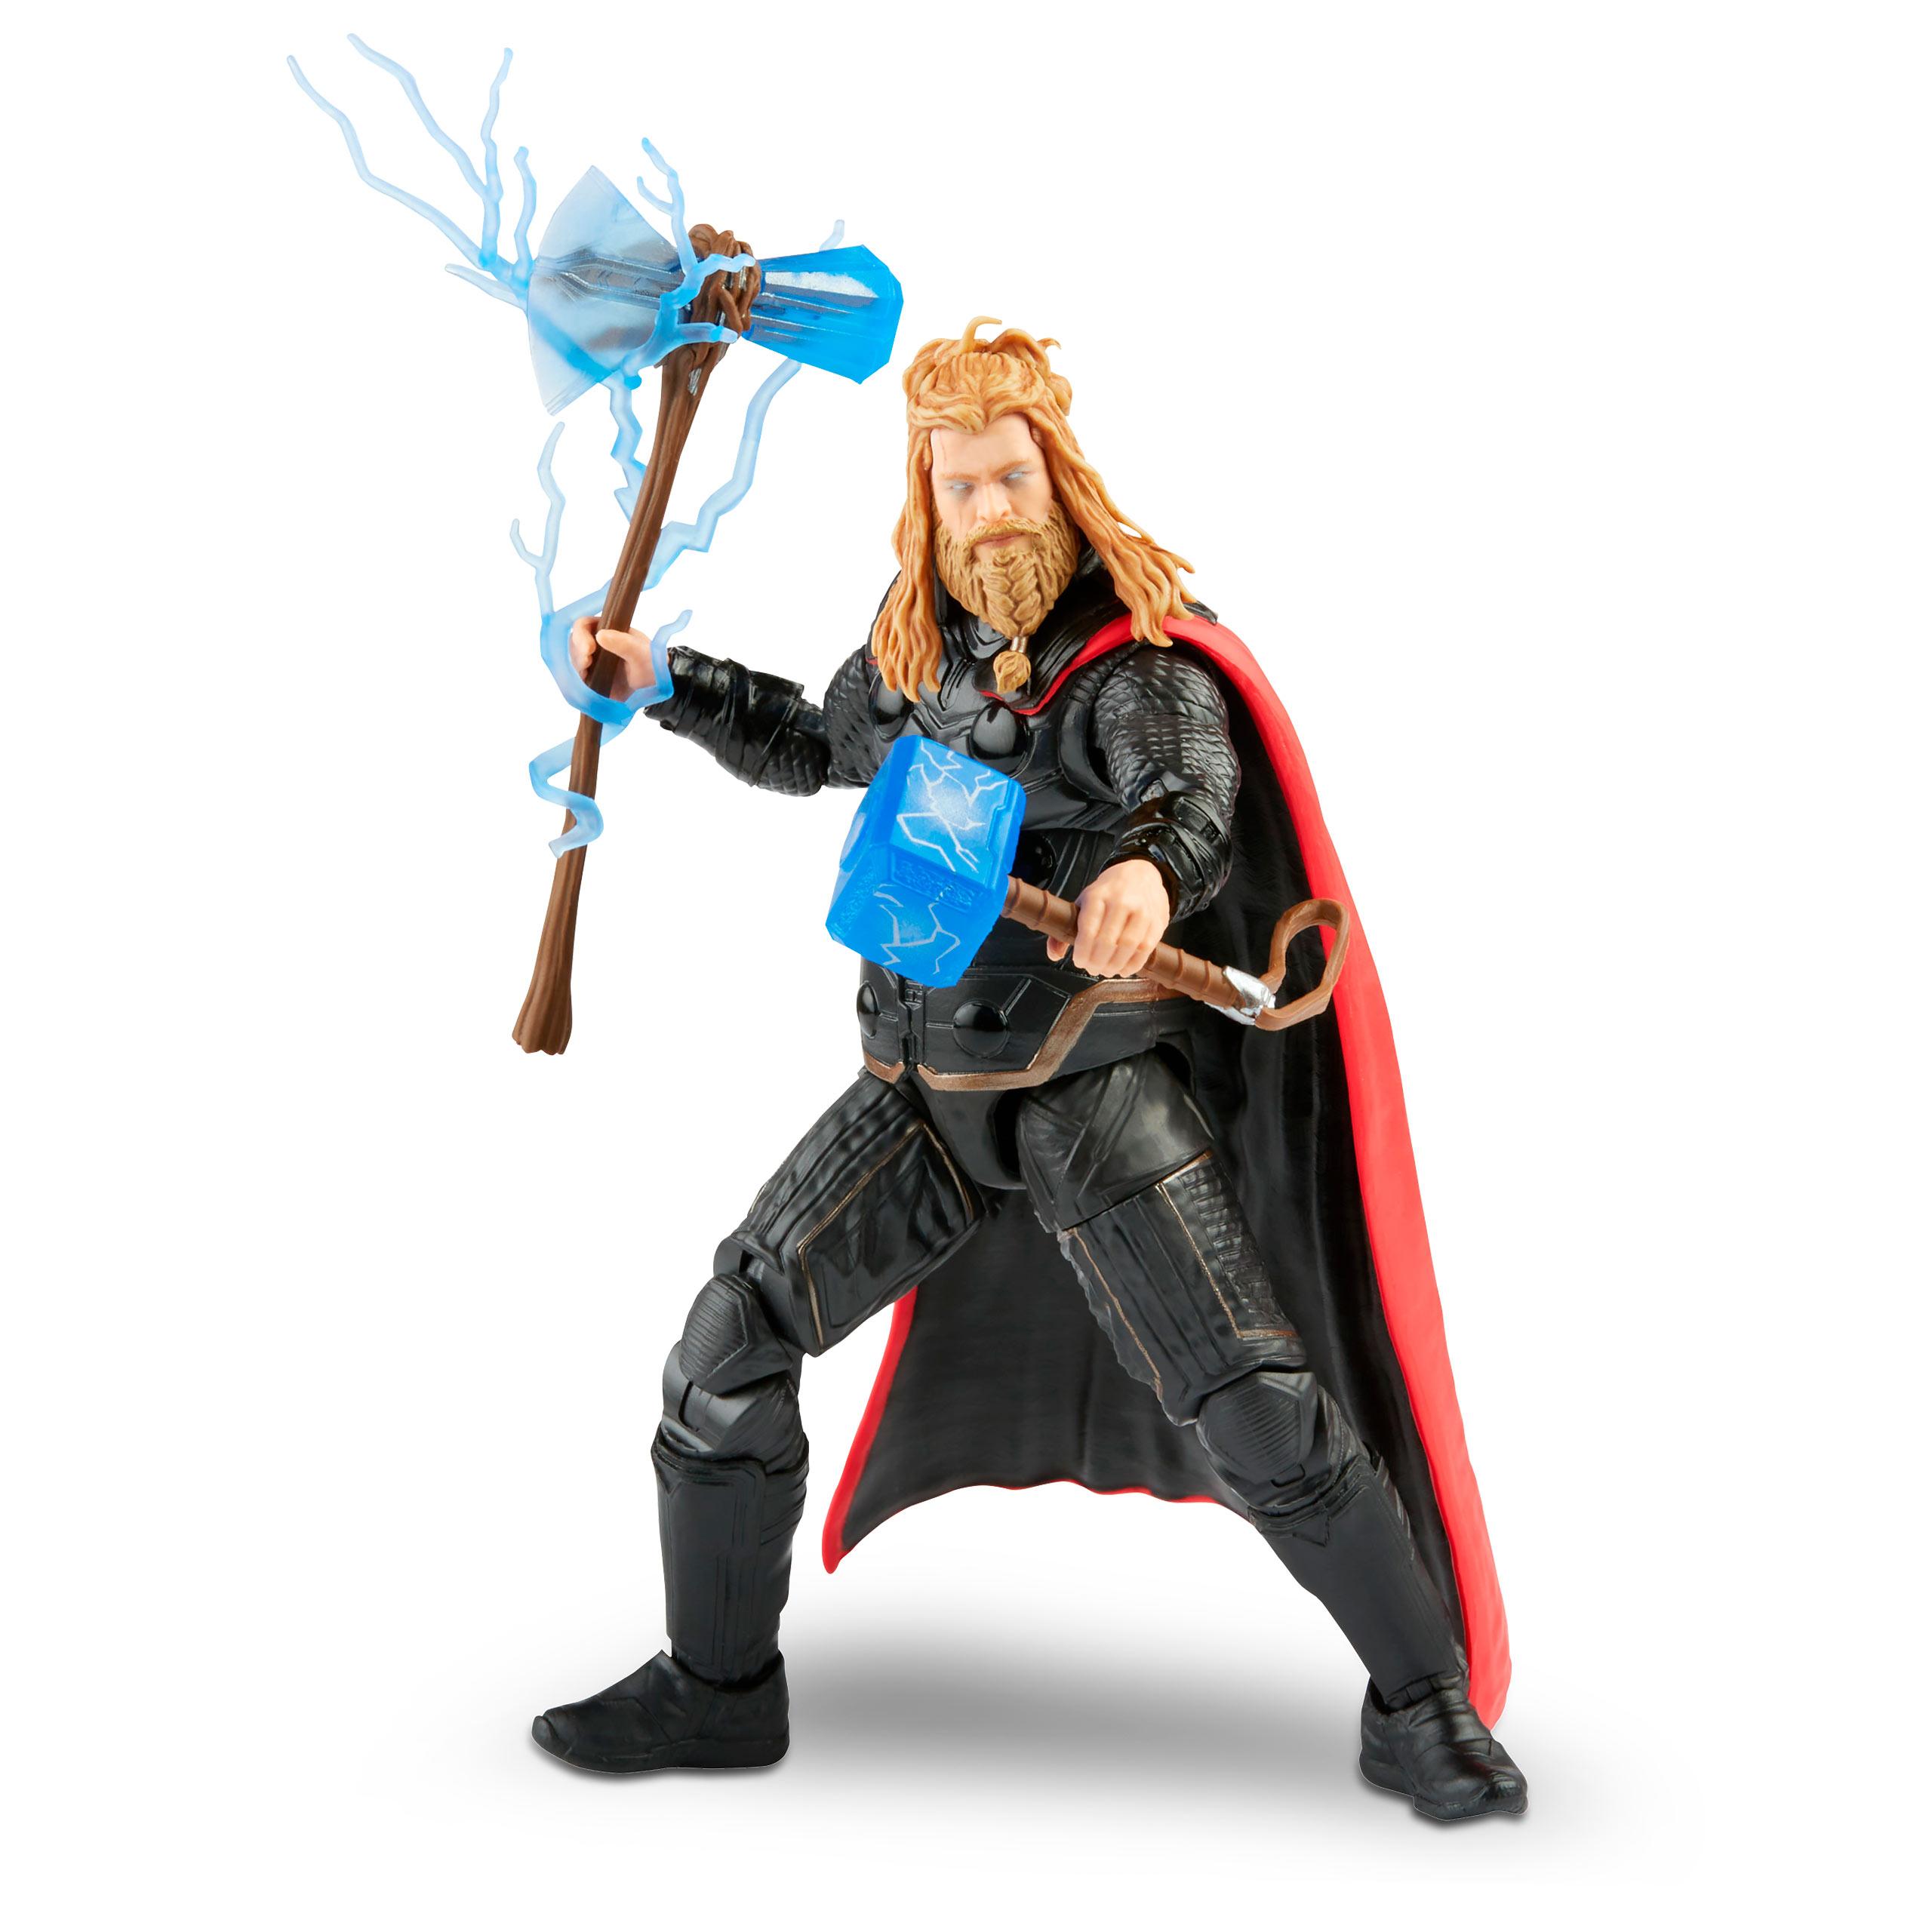 Thor Actionfigur 15cm - Avengers